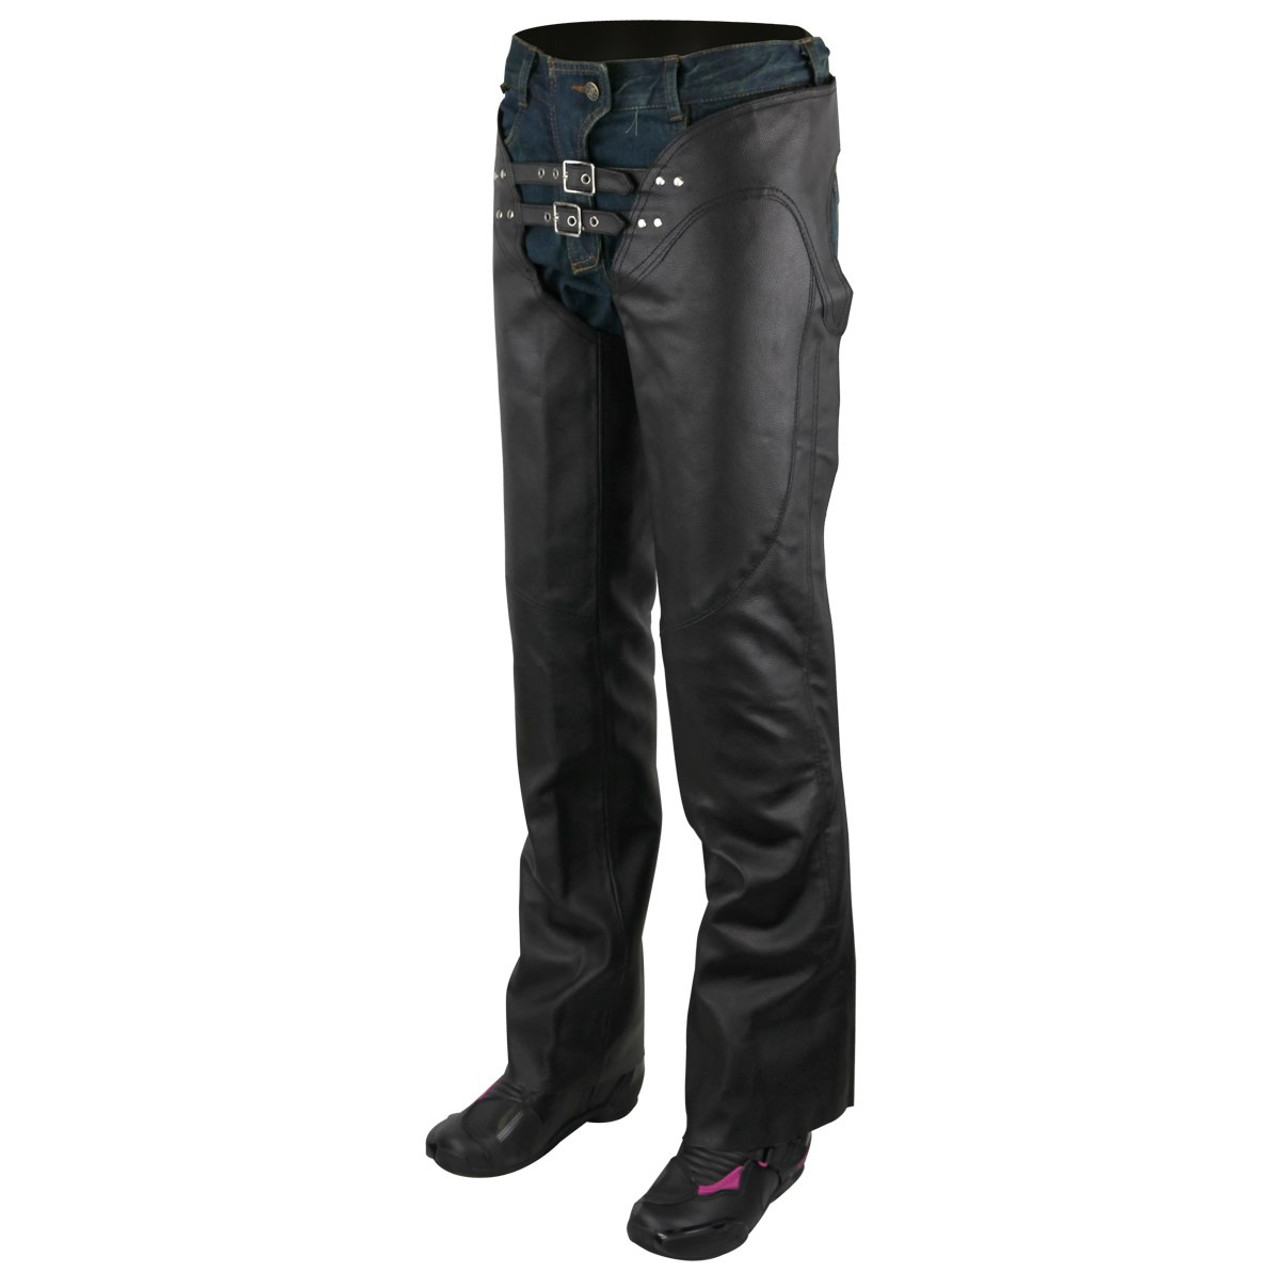 501 Style Fit Men/'s Modern Cut Waist 5 Pocket Cowhide Leather Jeans